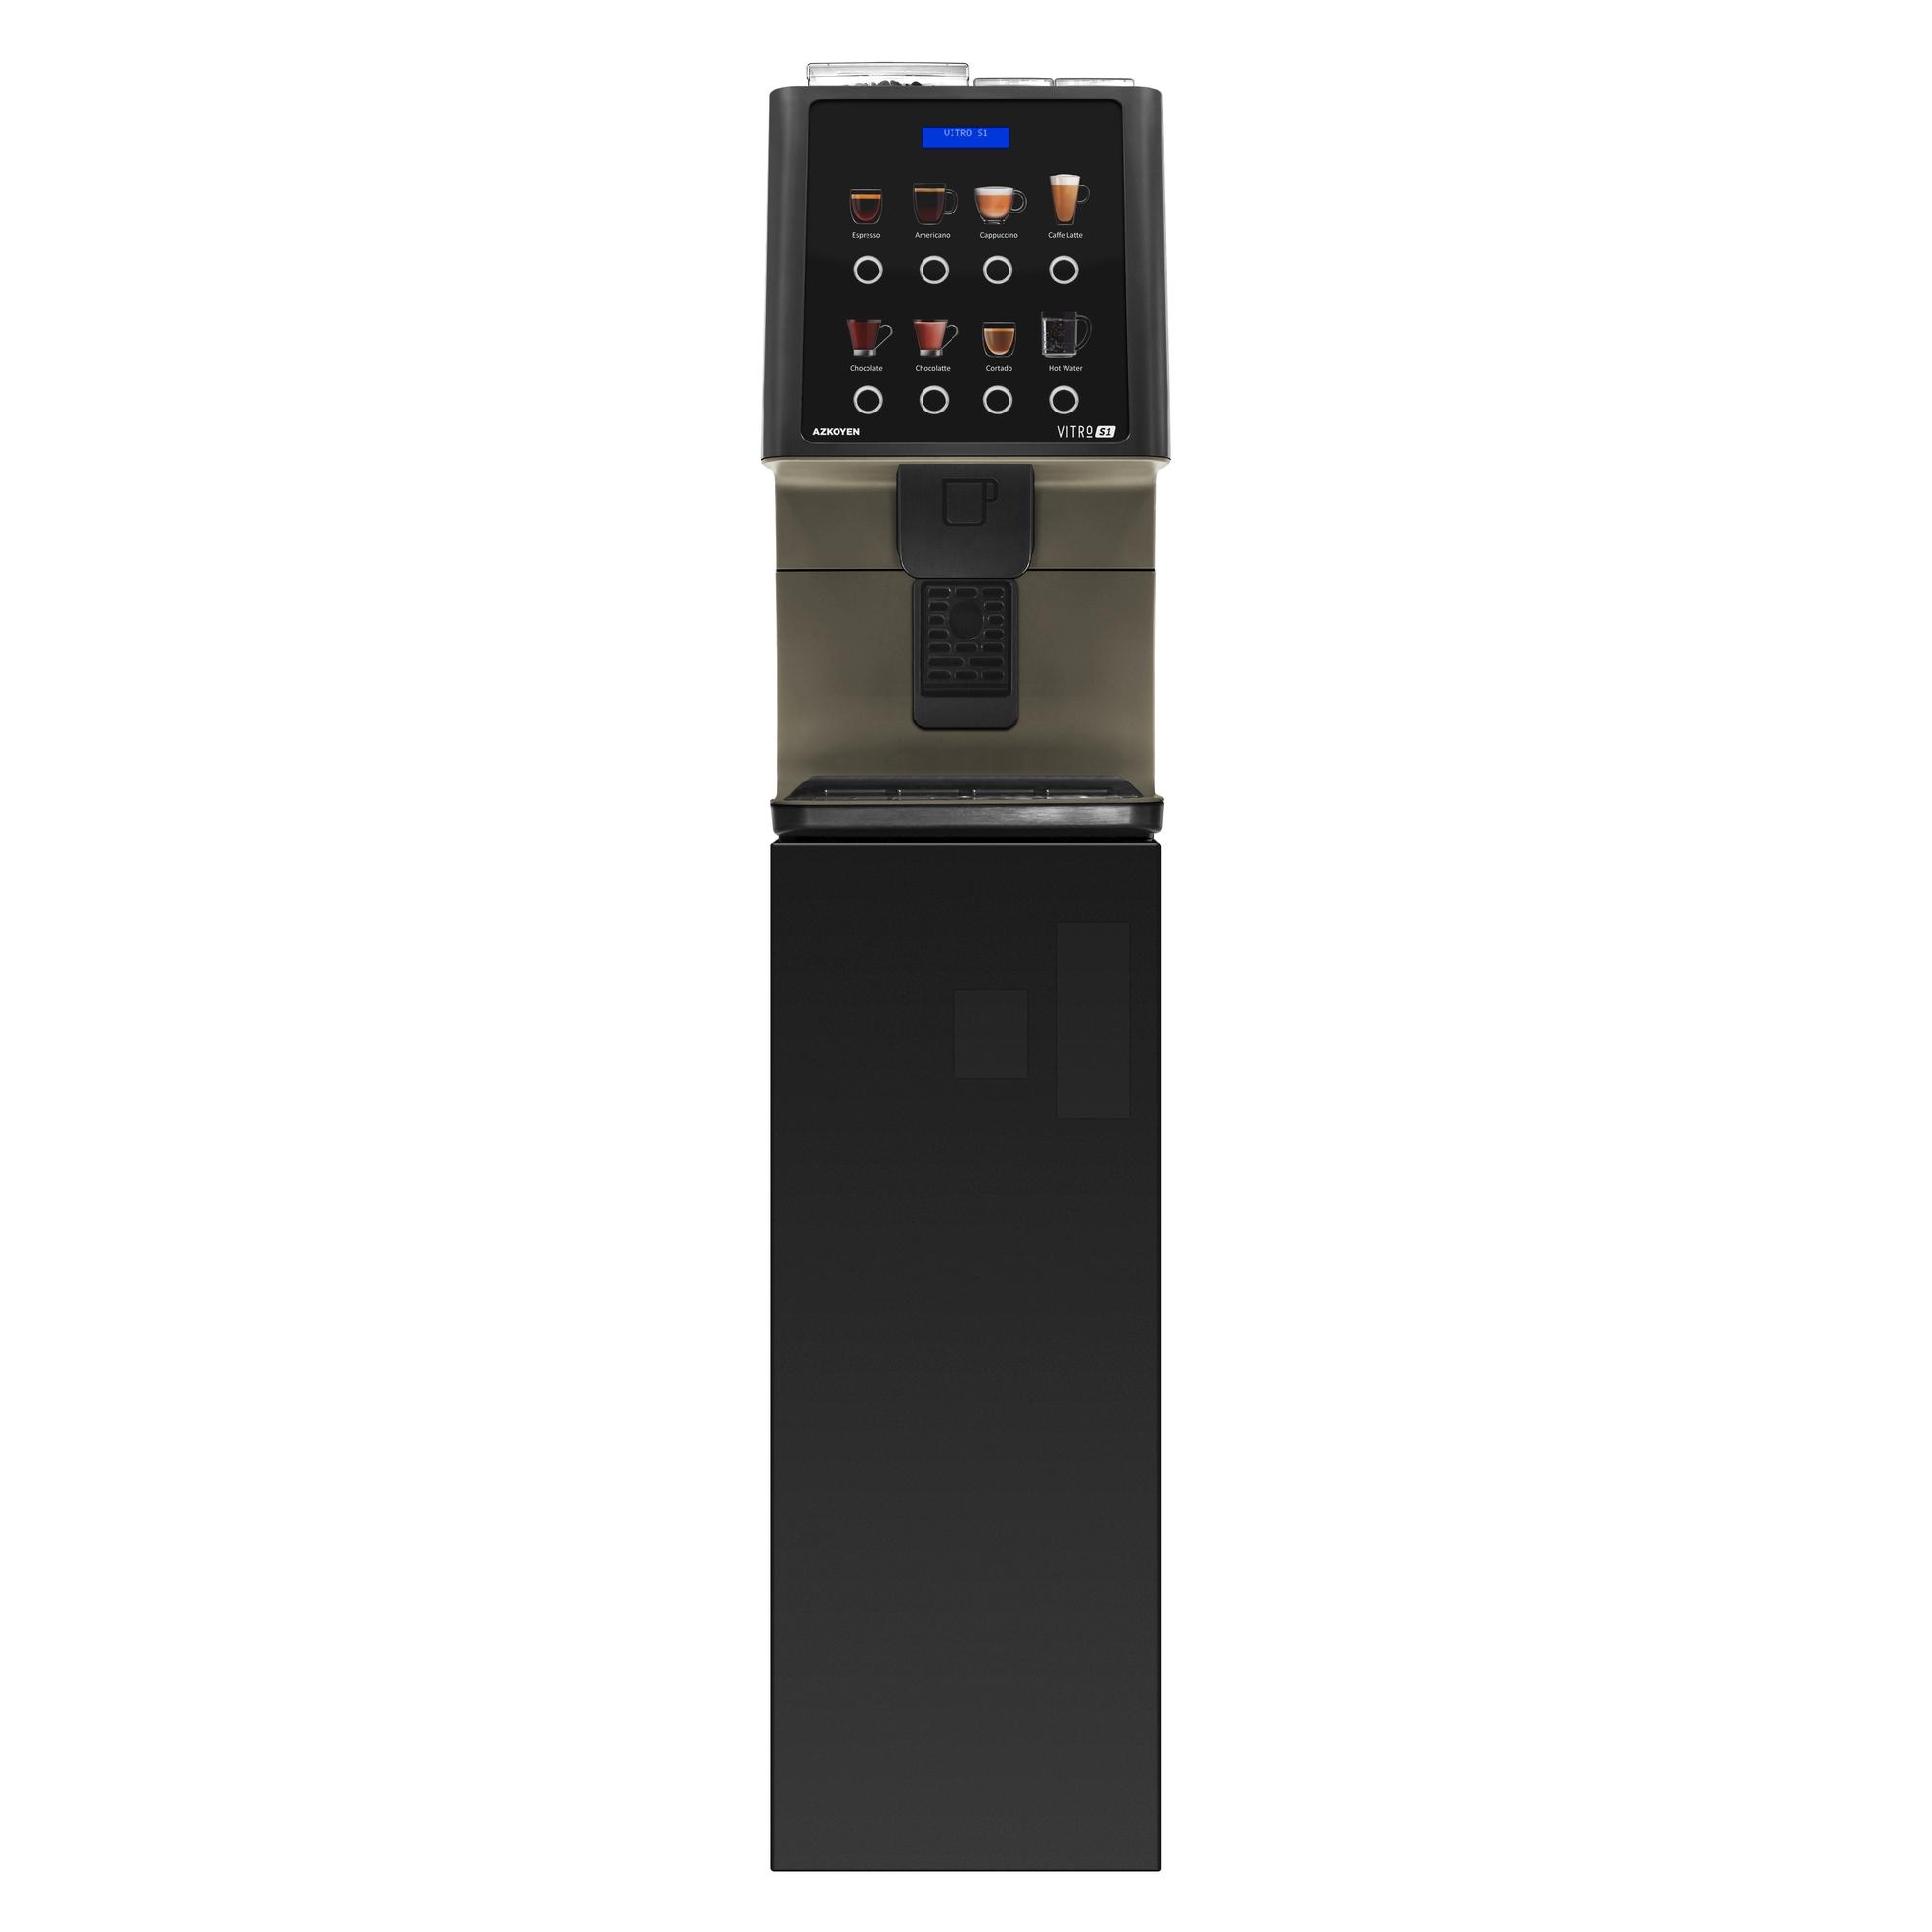 Coffeetek Vitro S1 Bean to Cup Coffee Machine on Base Cabinet